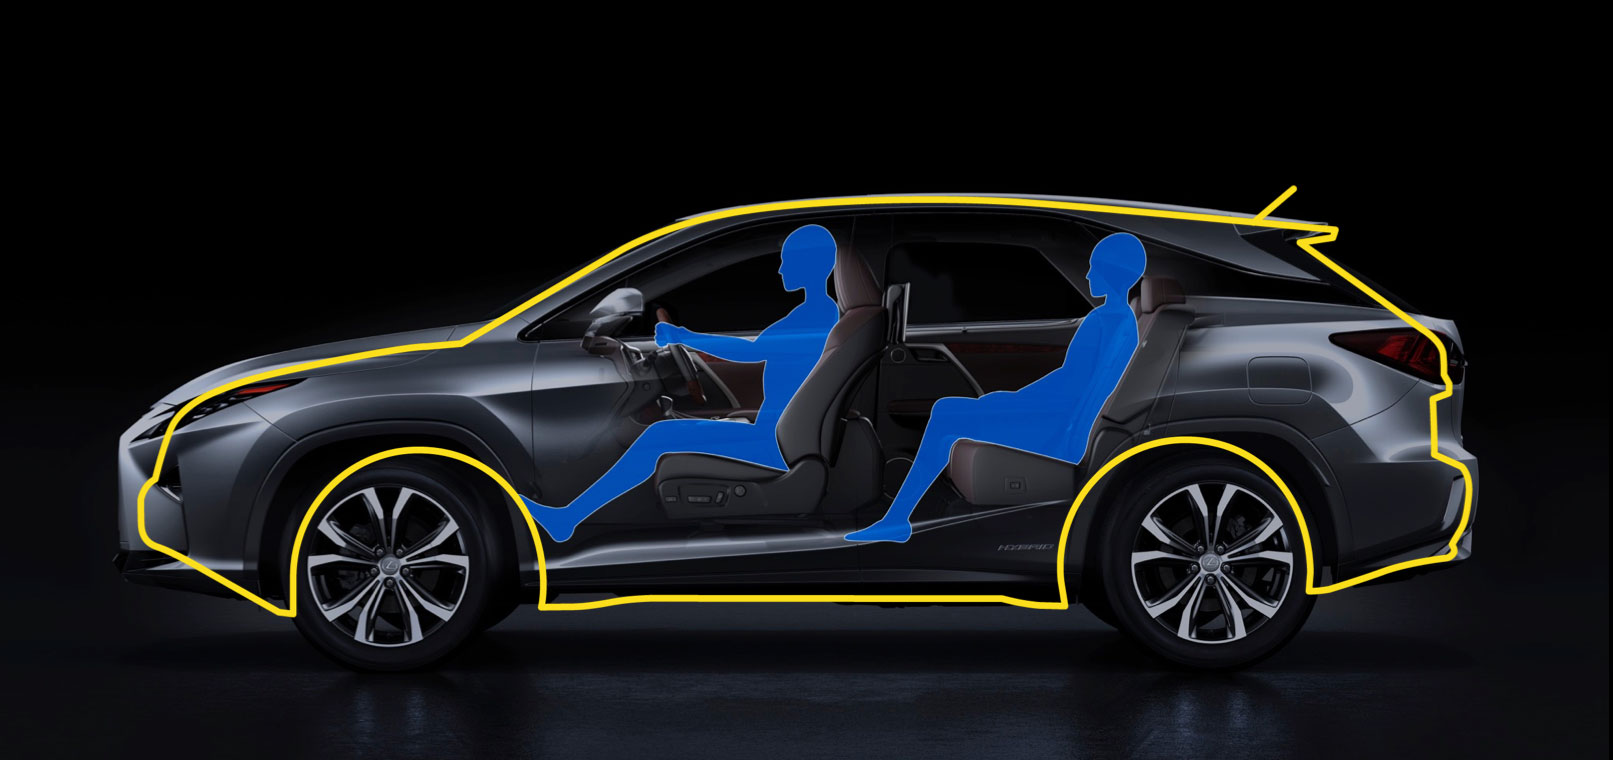 2016 Lexus Rx 350 450h Preview Enthusiast Rx450h Wiring Diagram Vs 2010 Model